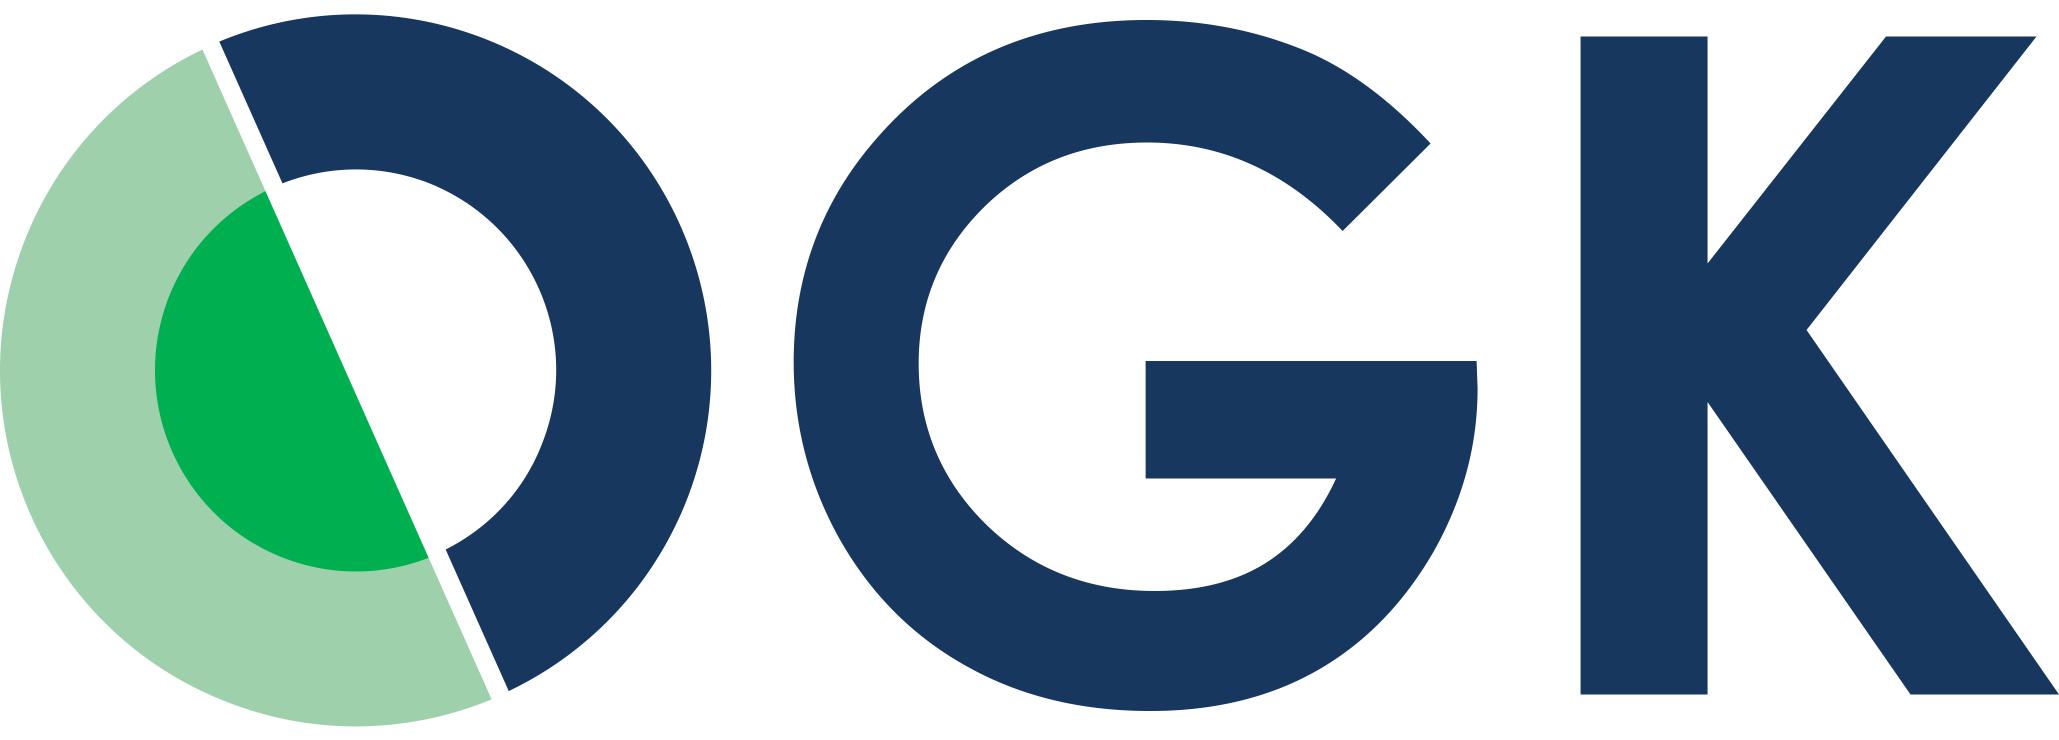 oegk-geodesy.at